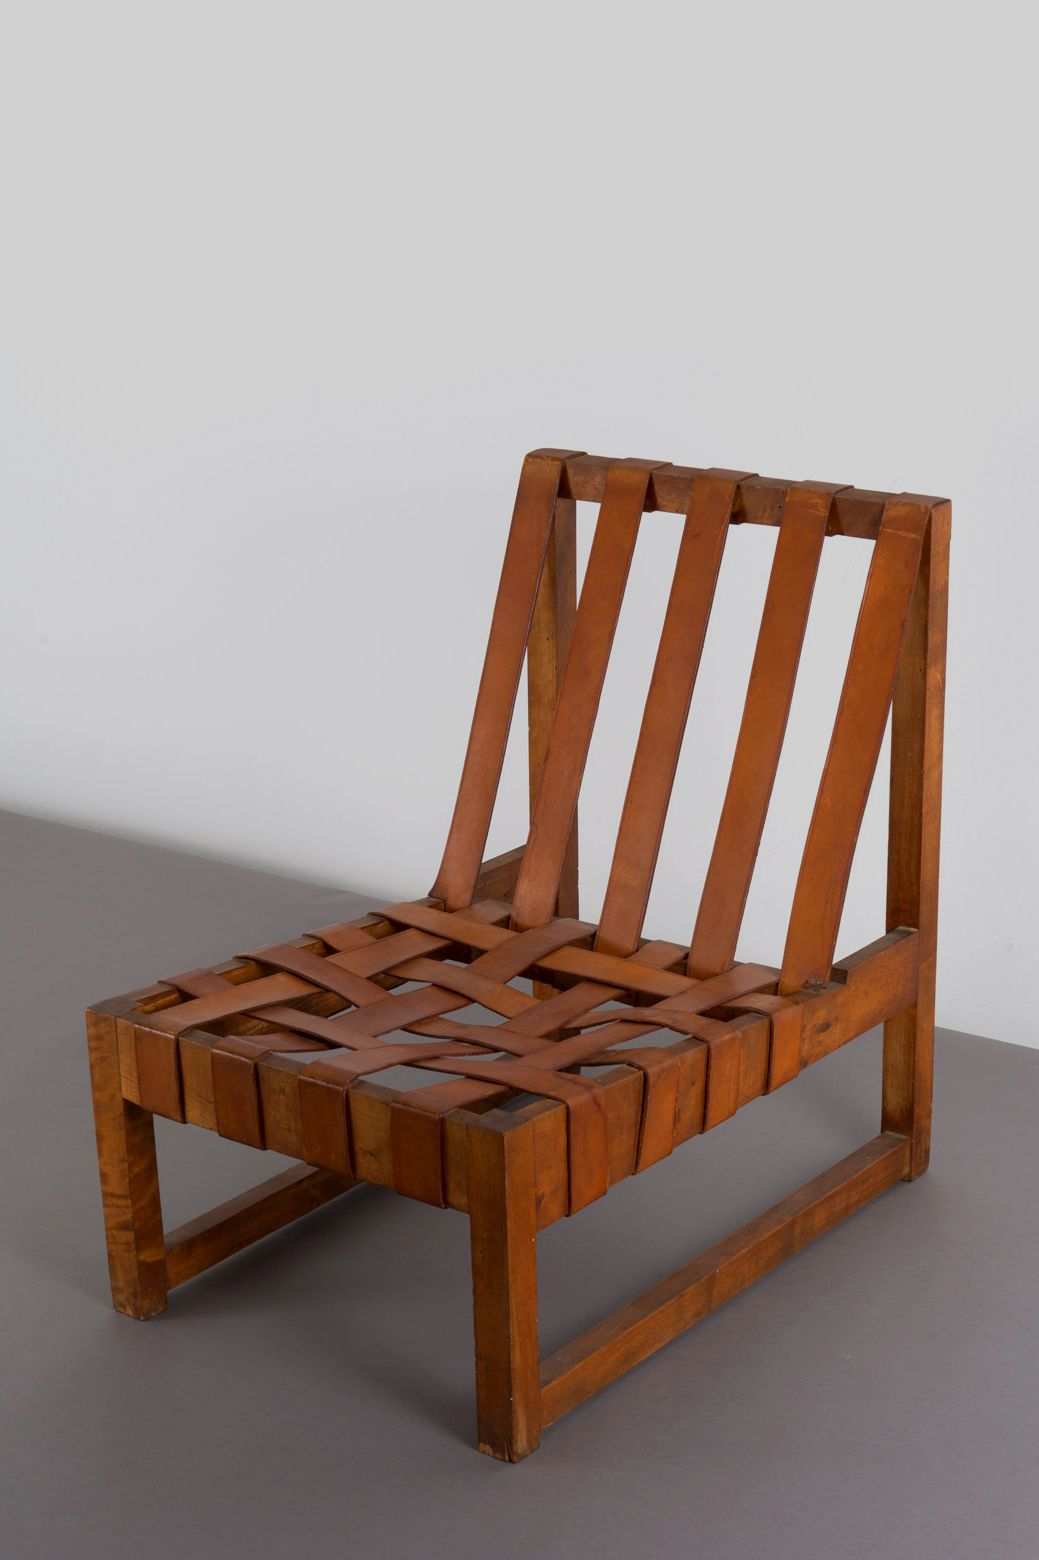 // Zwei 'Bauhaus'Sessel, 1920/30er Jahre Furniture